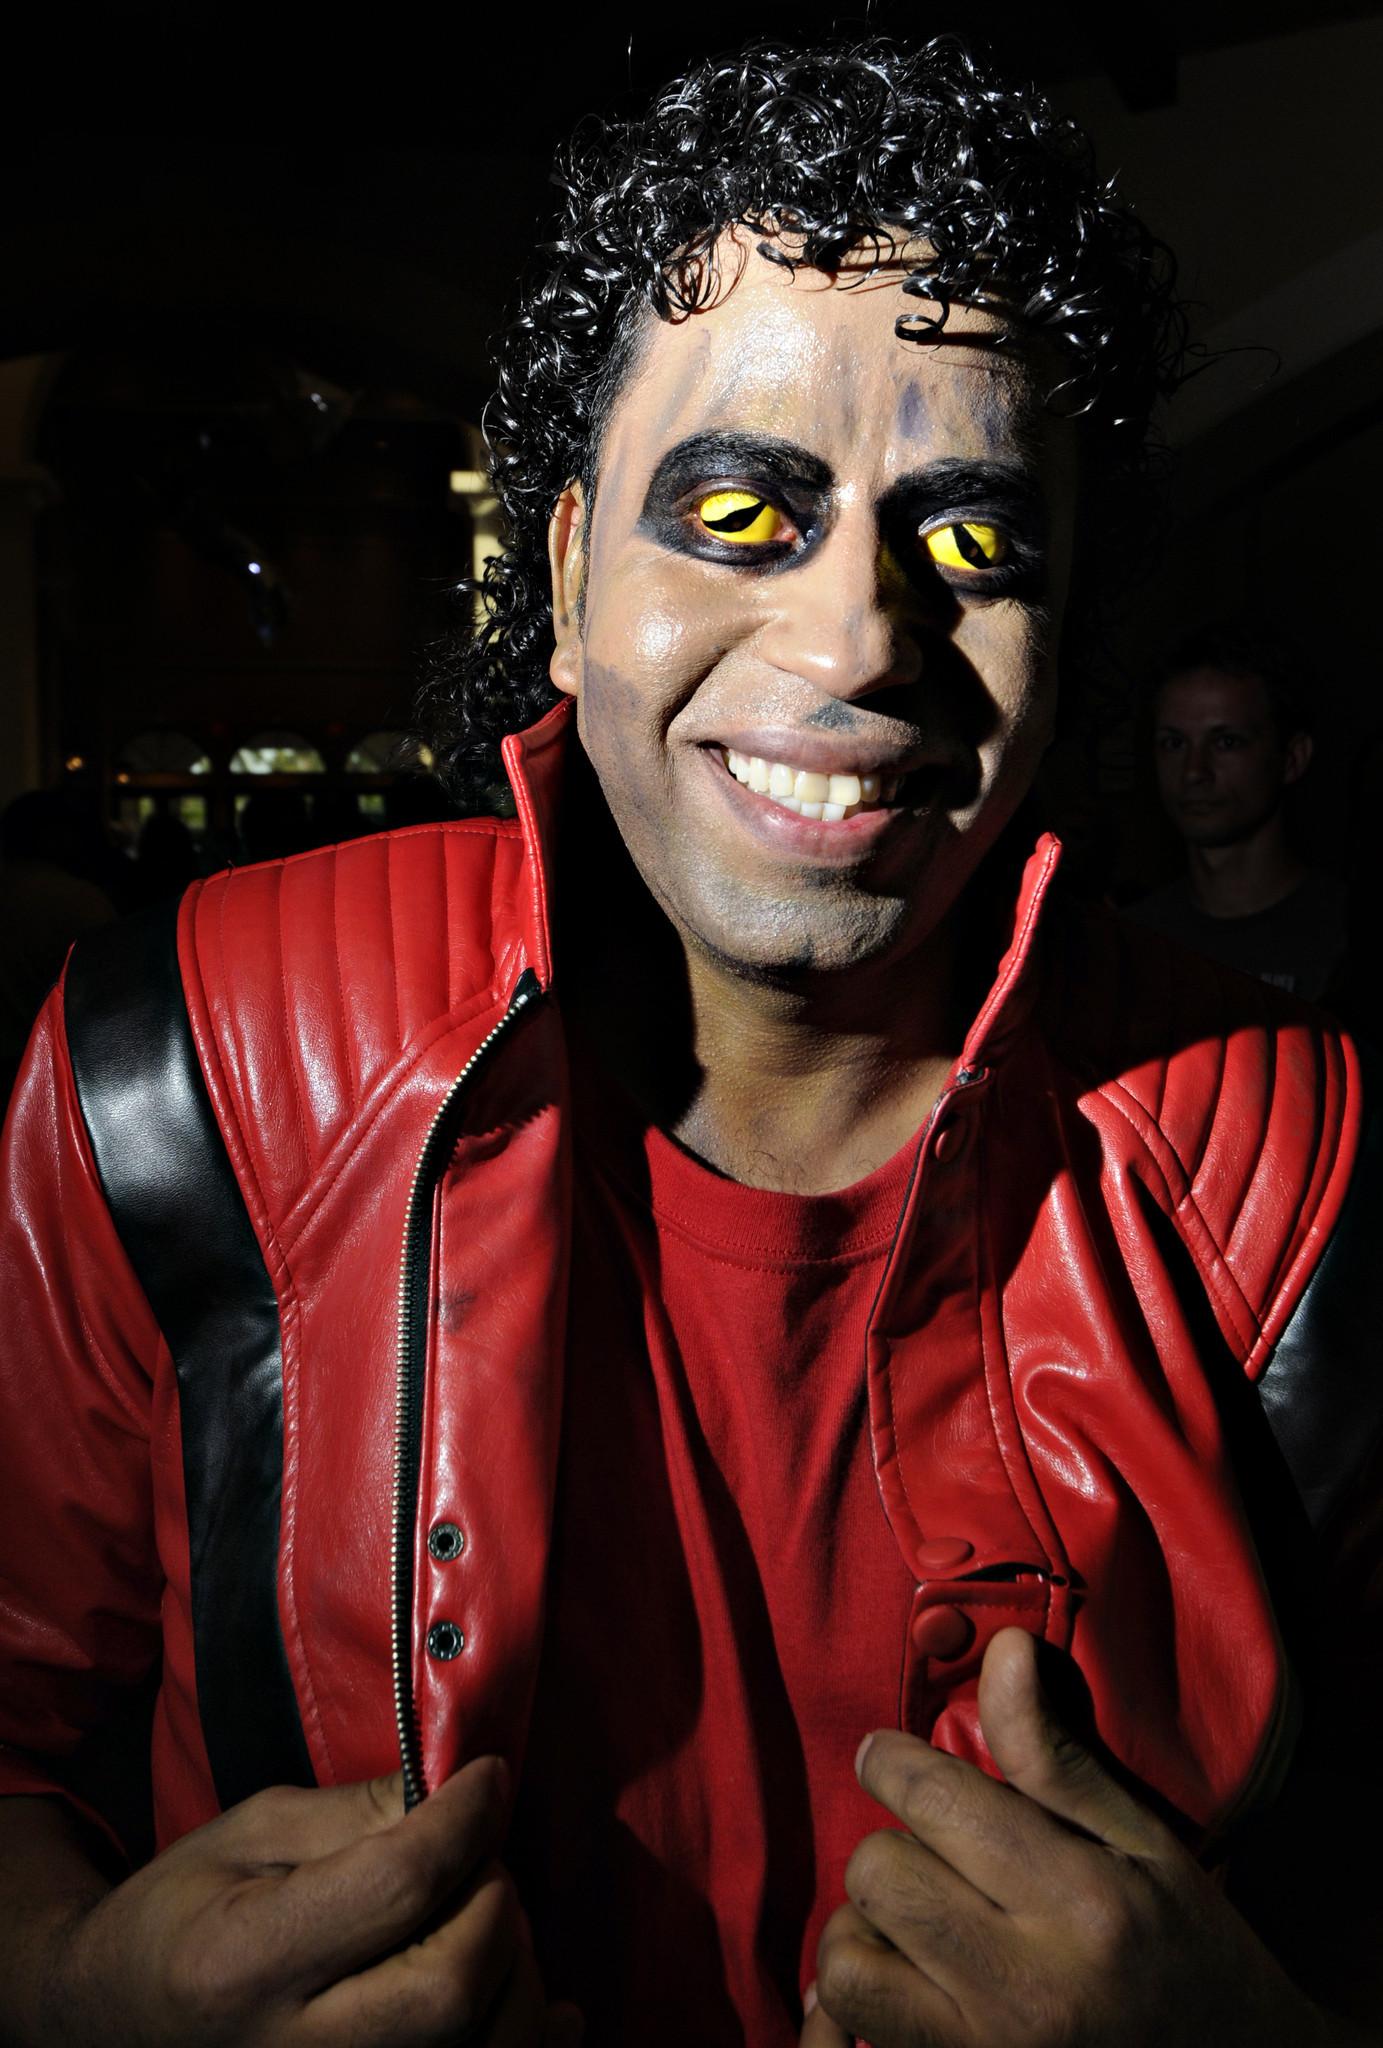 ICE warns Halloween partyers to beware costume contact lenses - Sun Sentinel  sc 1 st  Sun Sentinel & Now thatu0027s scary! ICE warns Halloween partyers to beware costume ...